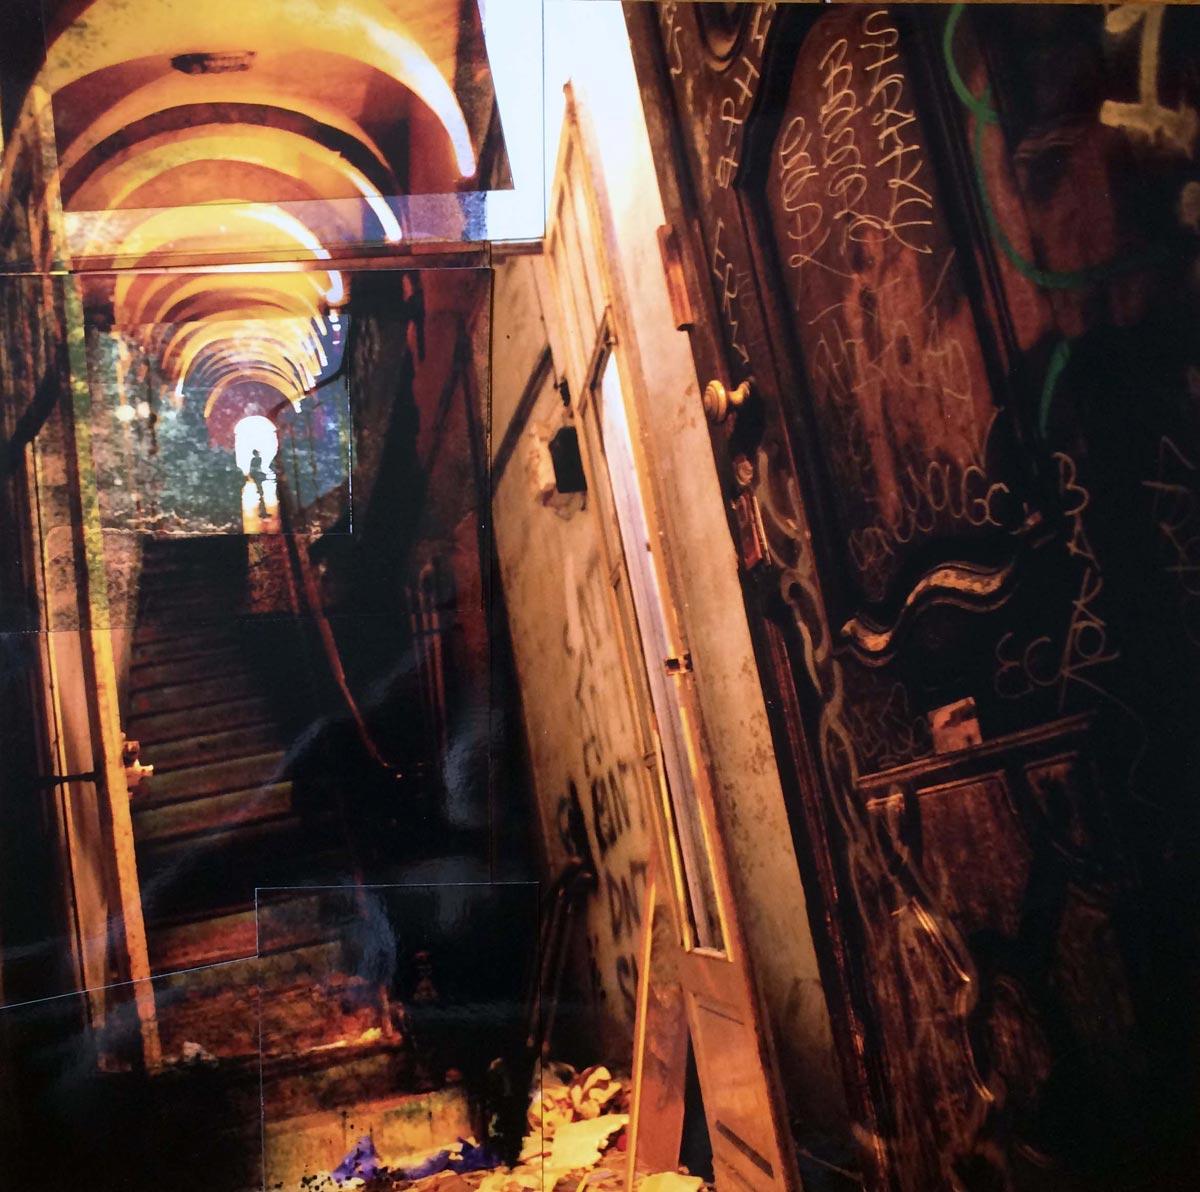 couvent - EmPinsan- Collage